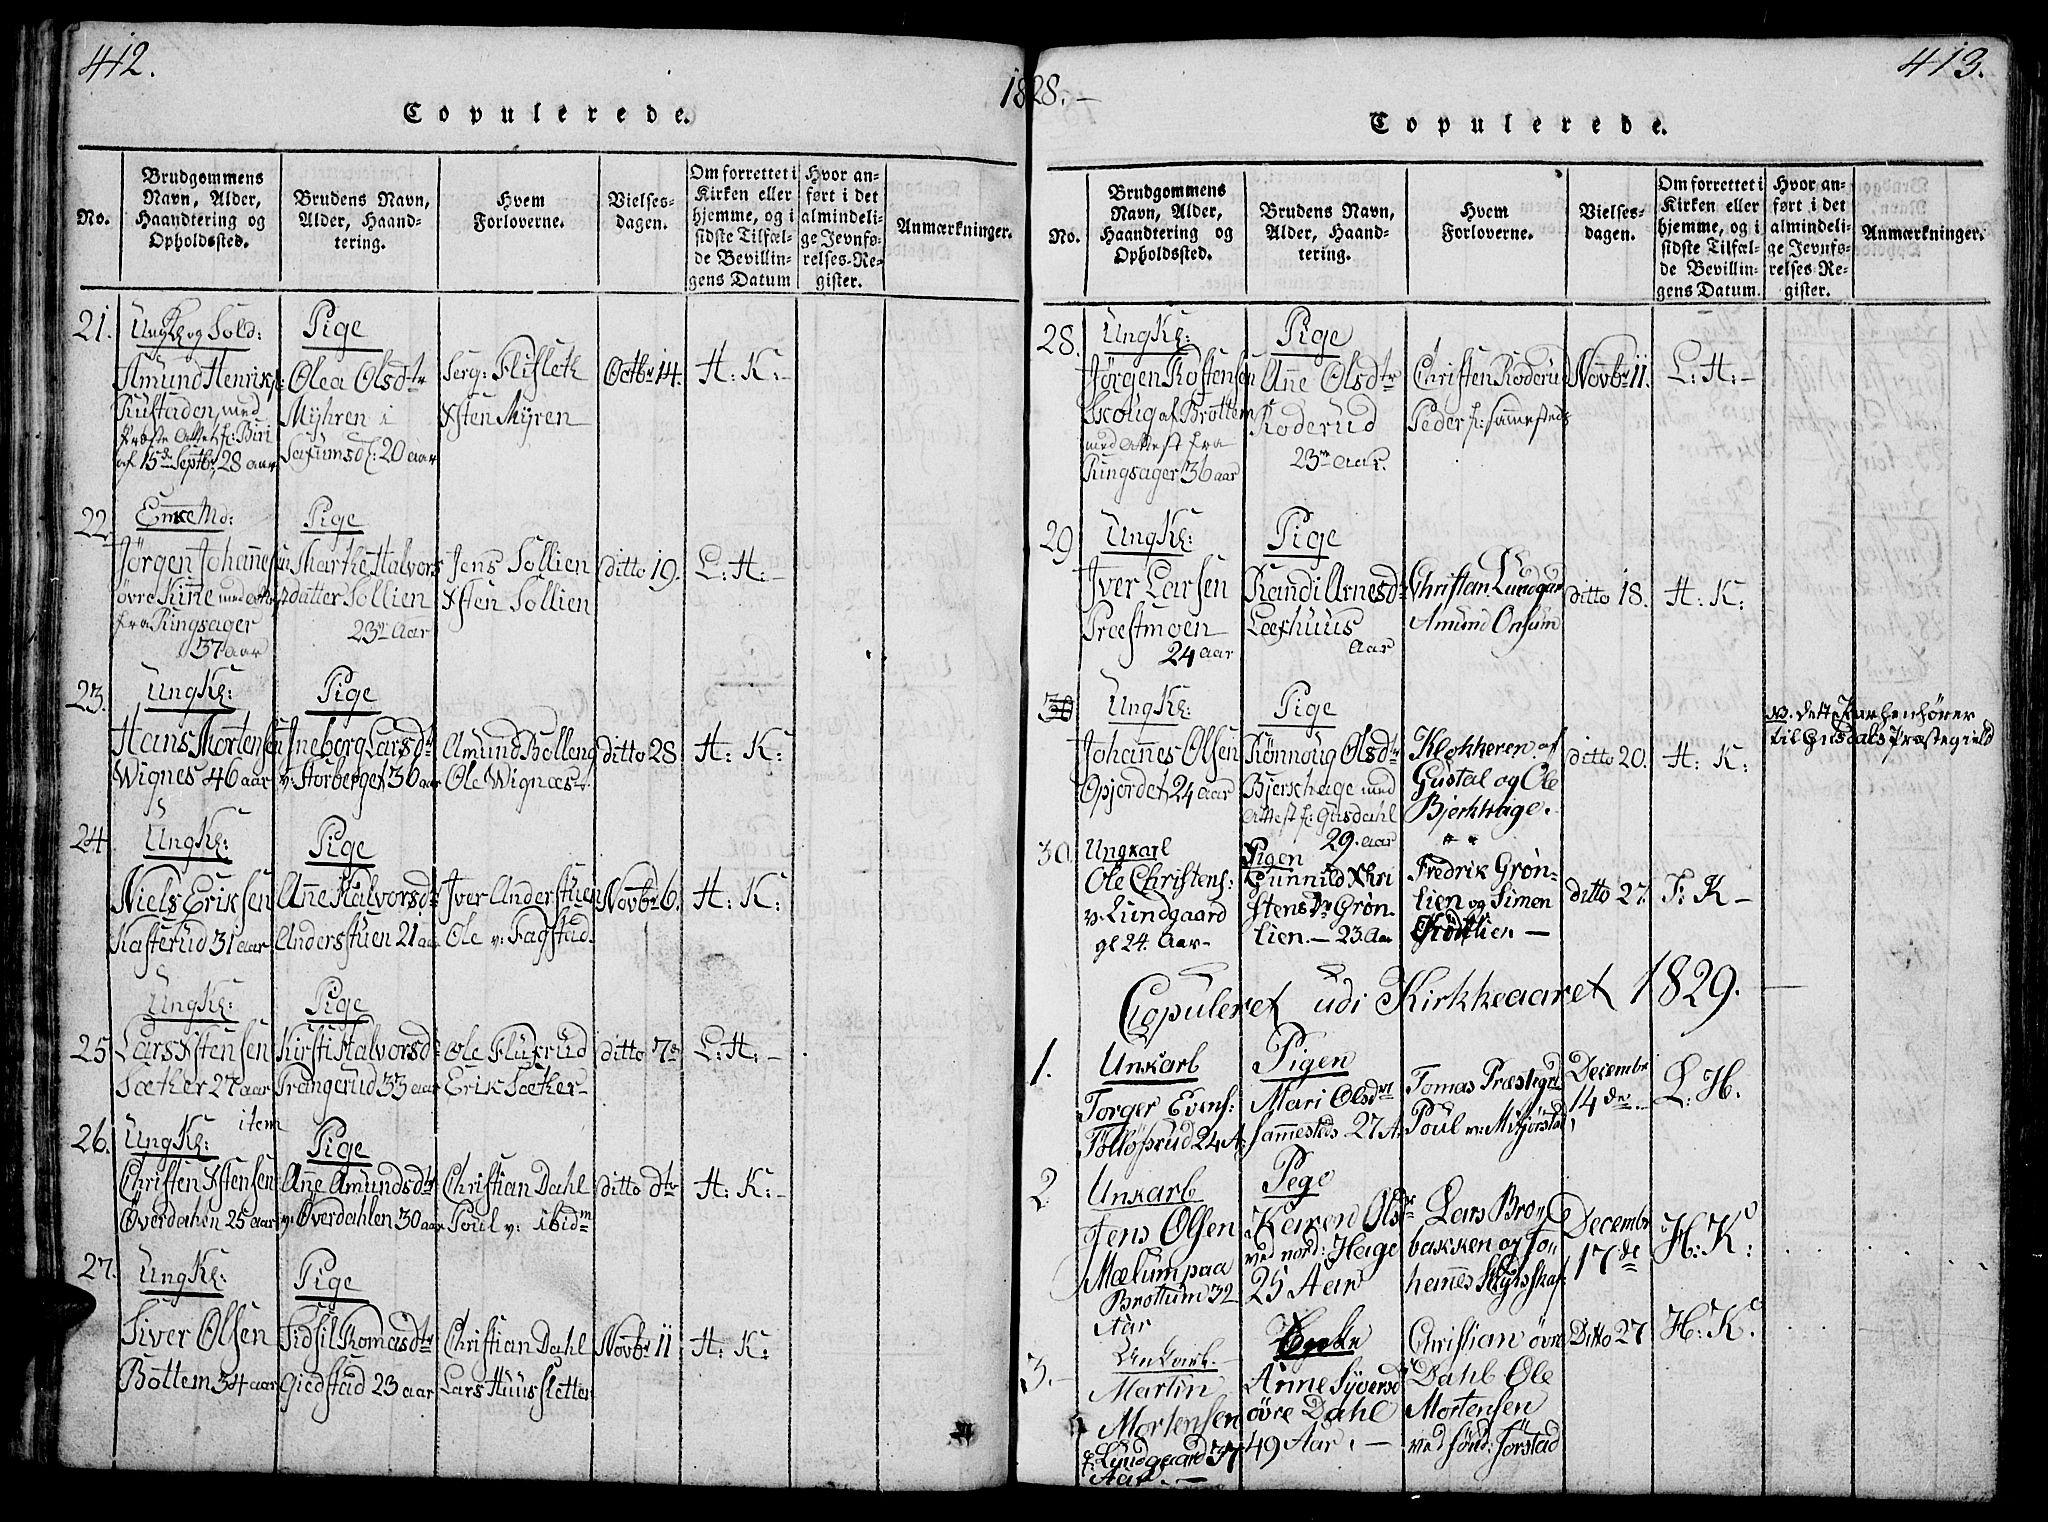 SAH, Fåberg prestekontor, Klokkerbok nr. 4, 1818-1837, s. 412-413